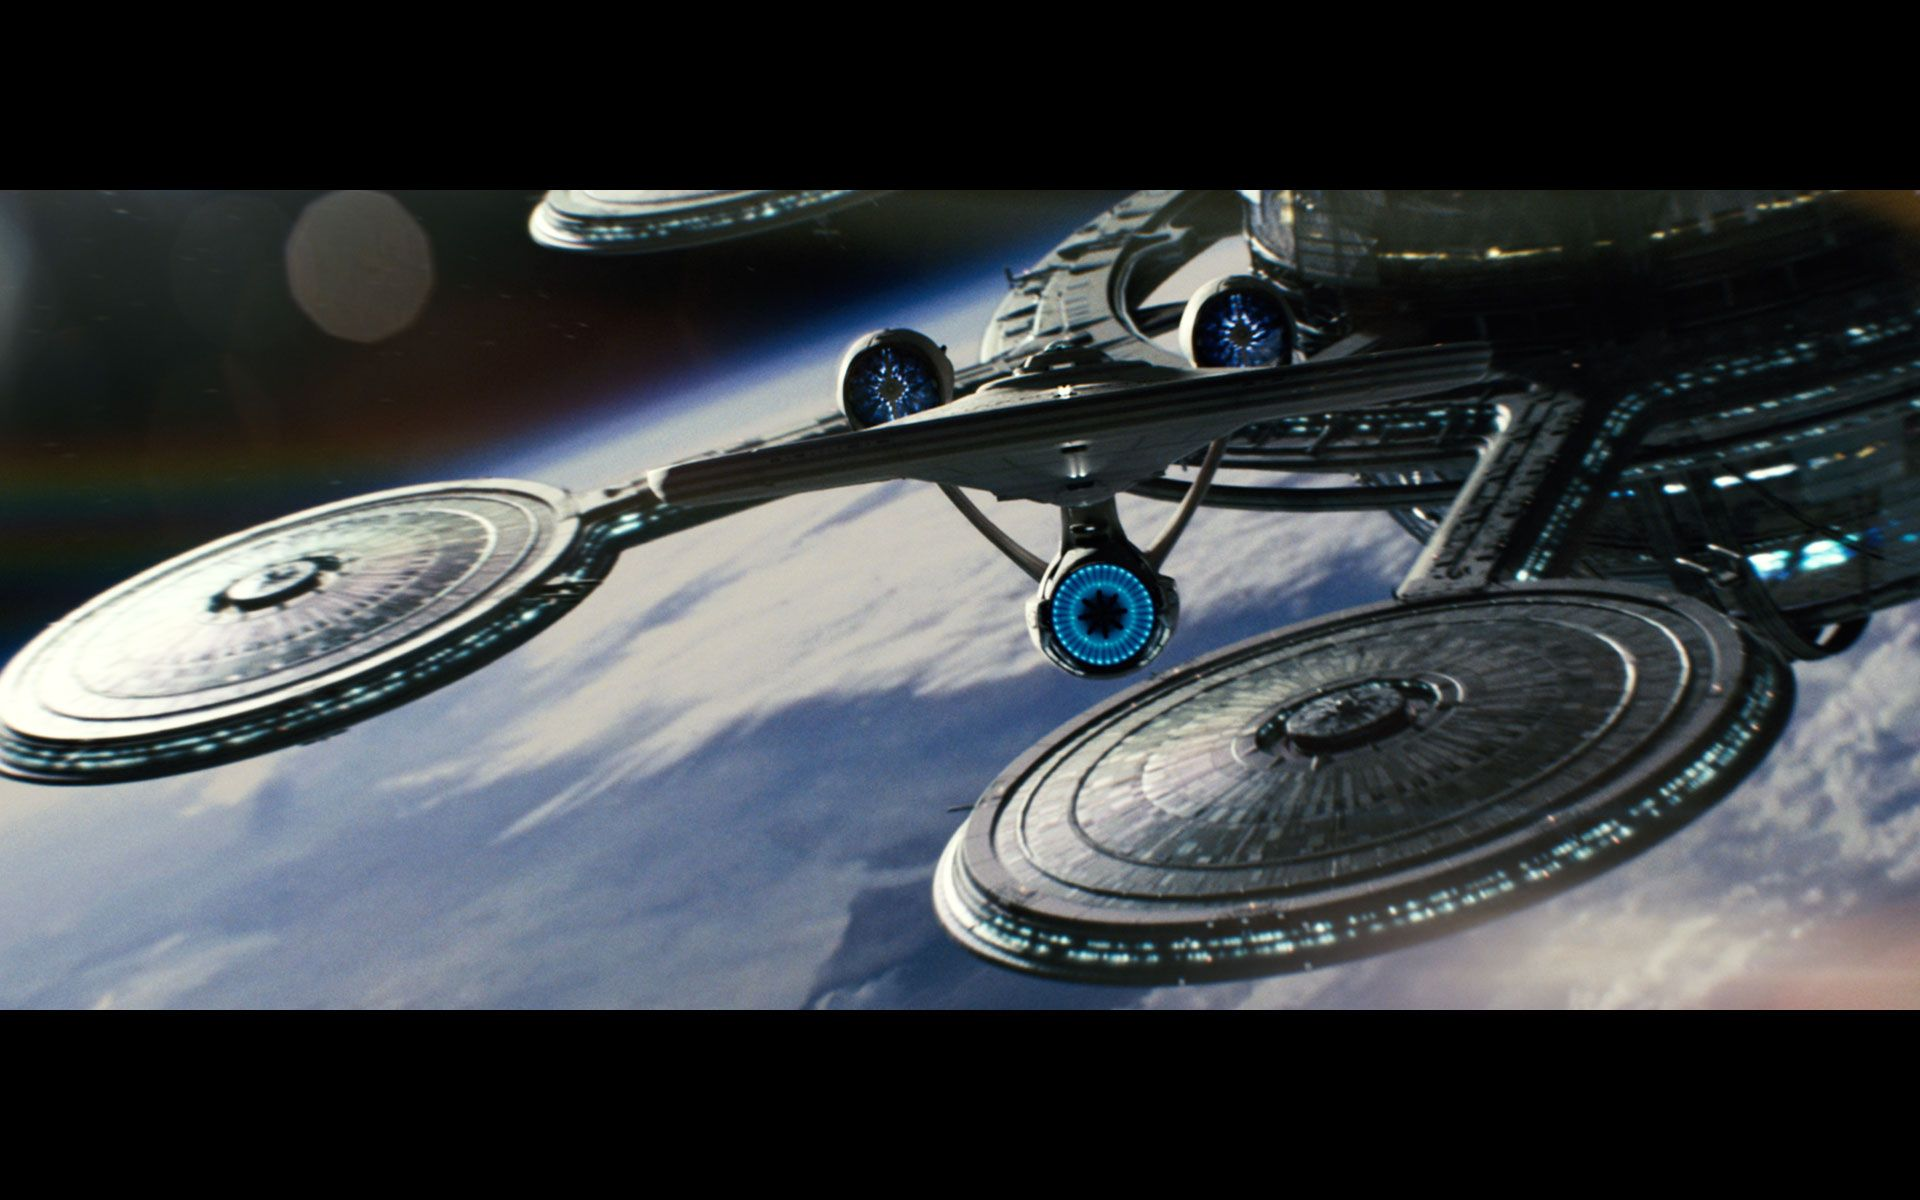 Star Trek Enterprise Wallpapers   Full HD wallpaper search   page 2 1920x1200